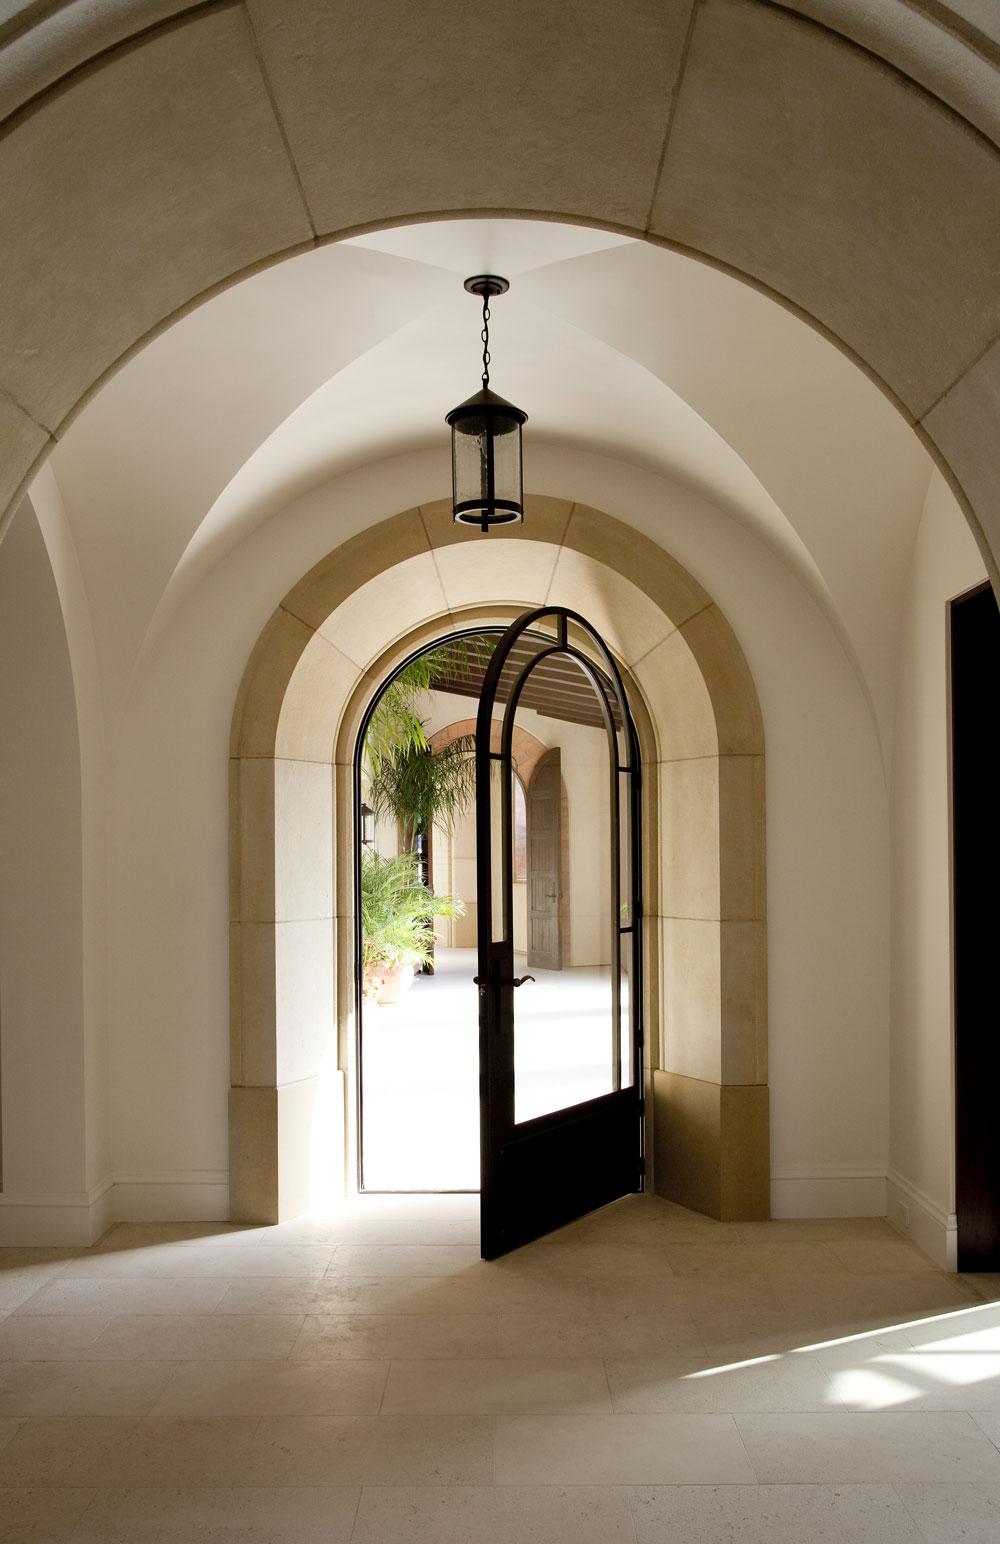 Modern-Spanish-Entryway-Cathedral-Ceiling-Arched-Doorway-Corbin-Reeves.jpg